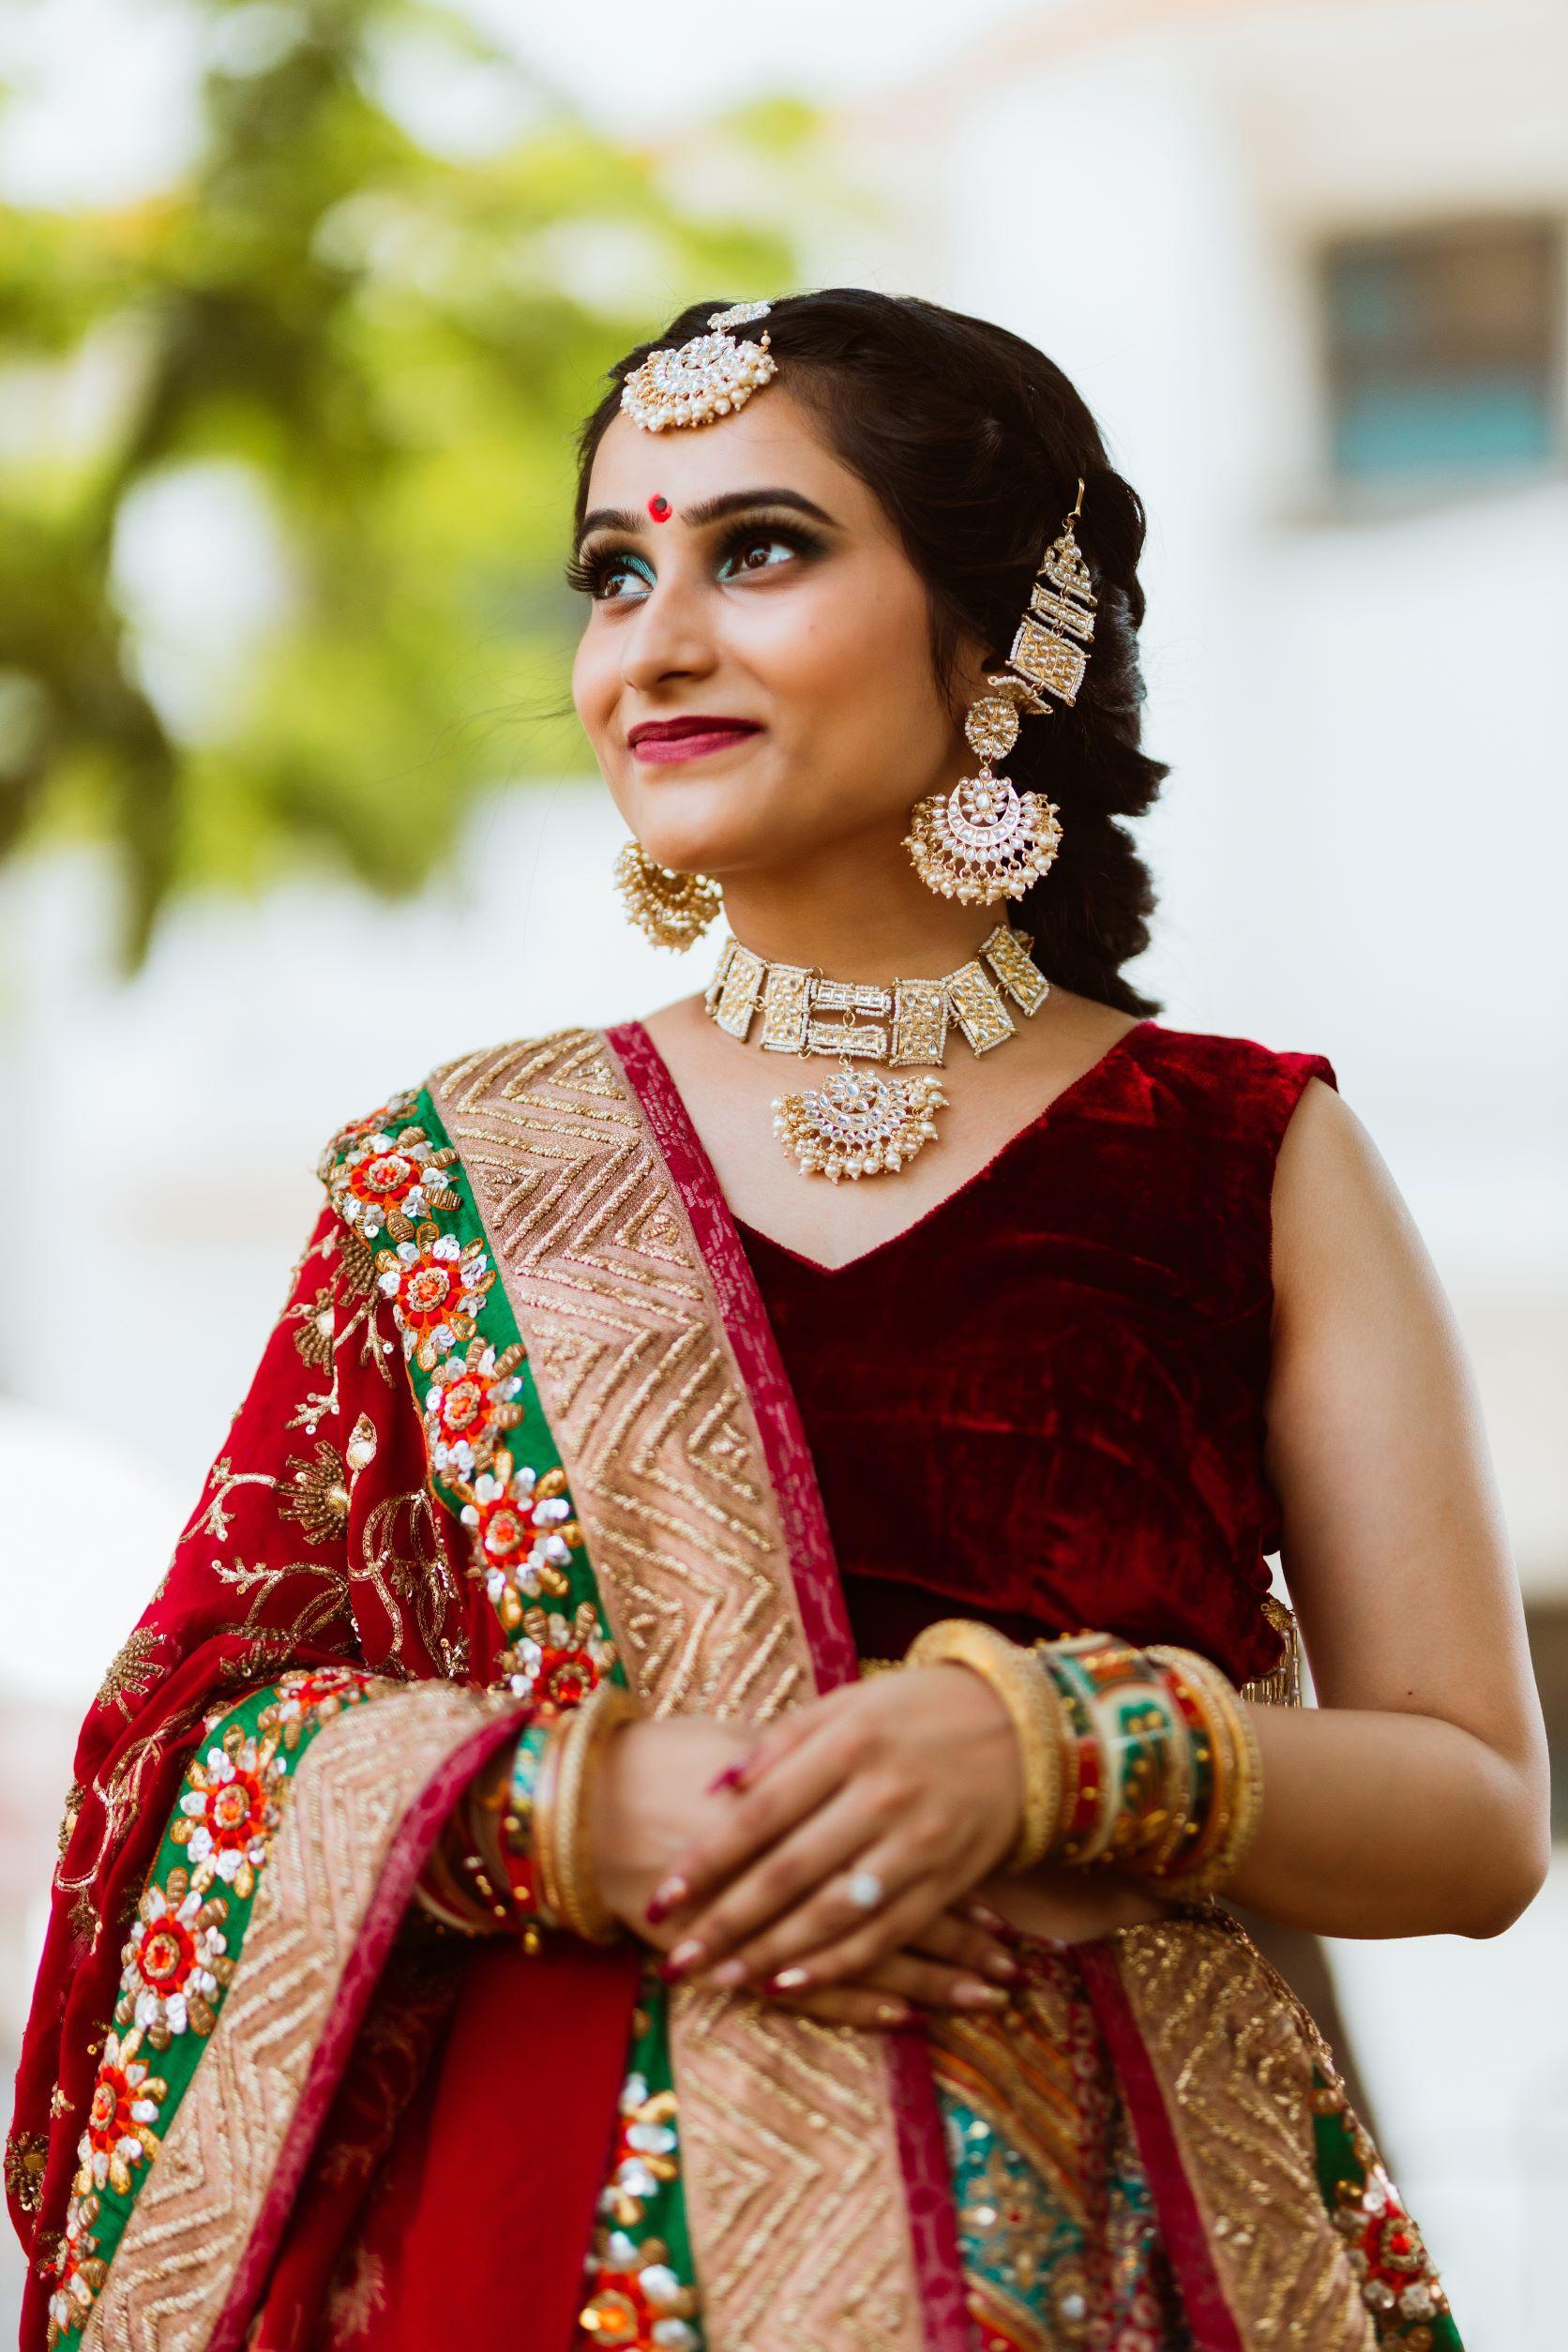 bride in red bridal lehenga and kundan jewellery